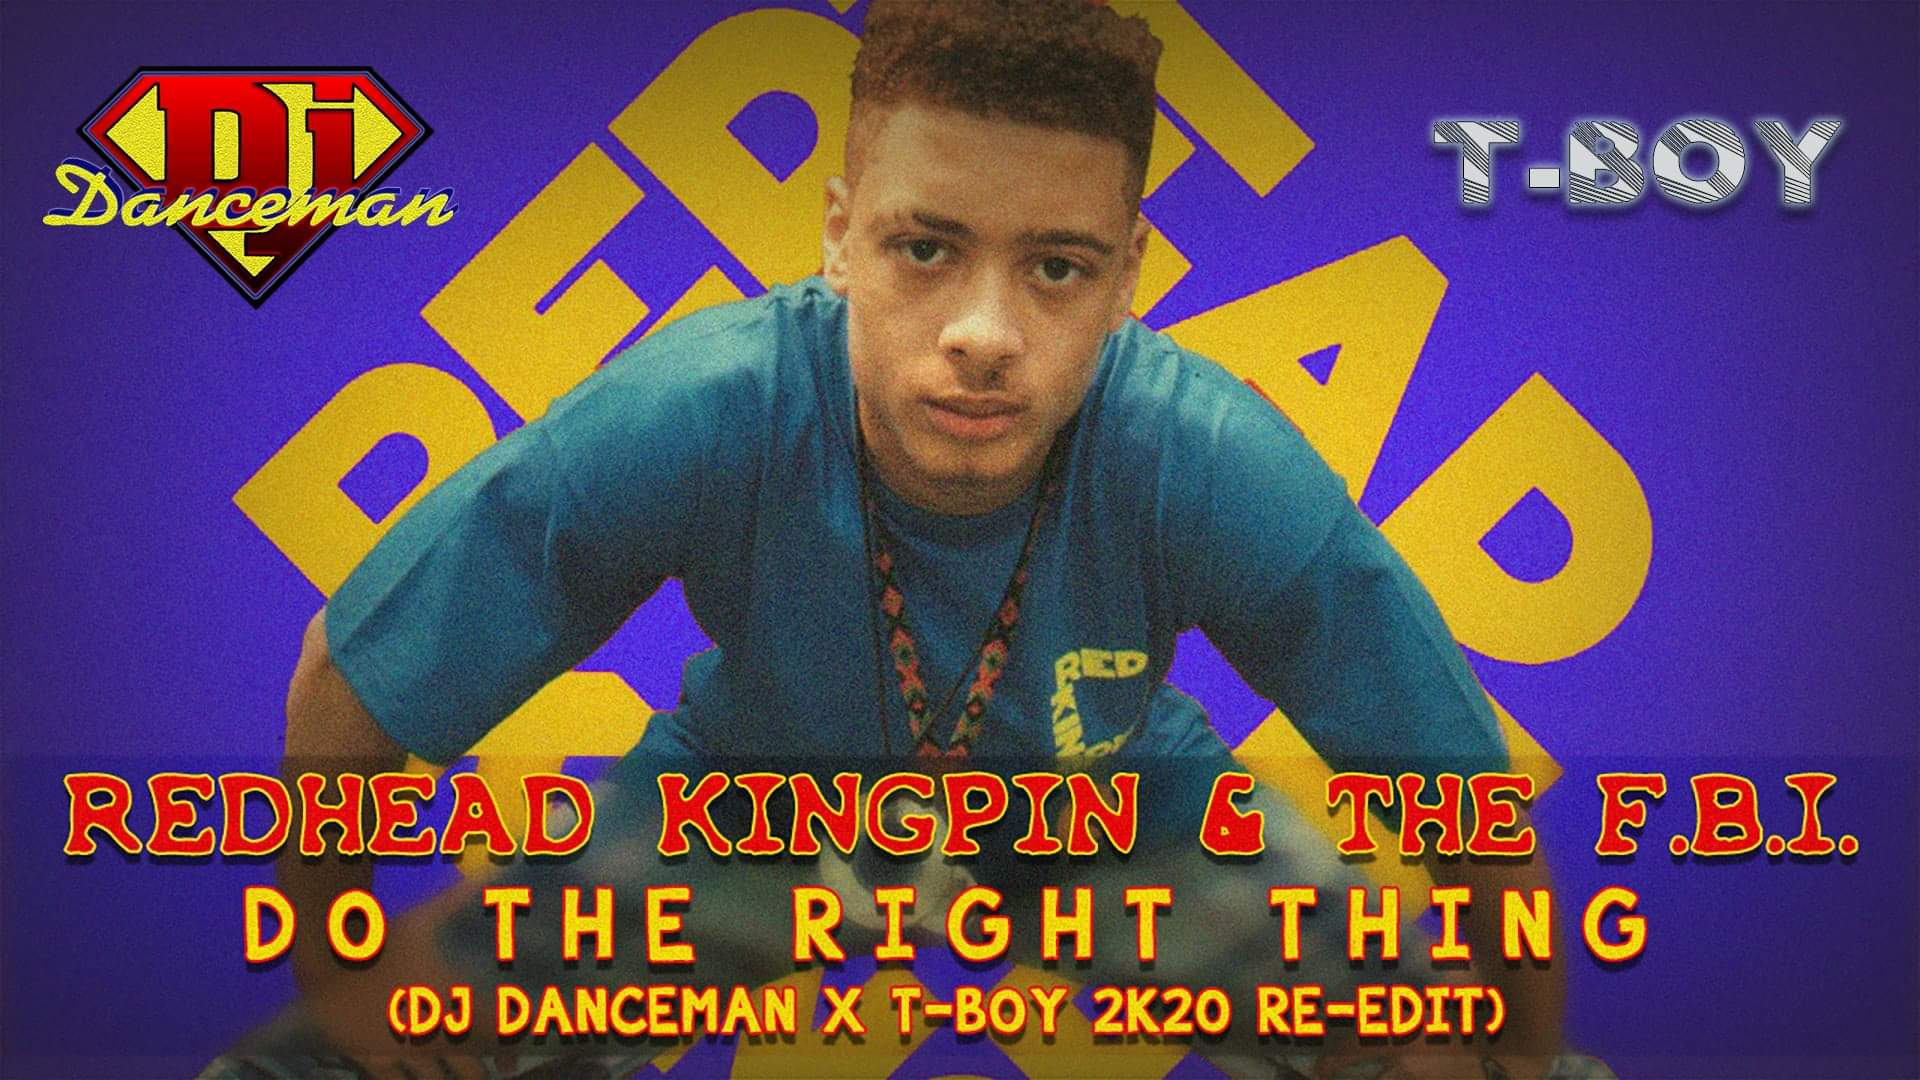 Redhead Kingpin & The FBI - Do the Right Thing (Dj Danceman x T-Boy ReBoot)